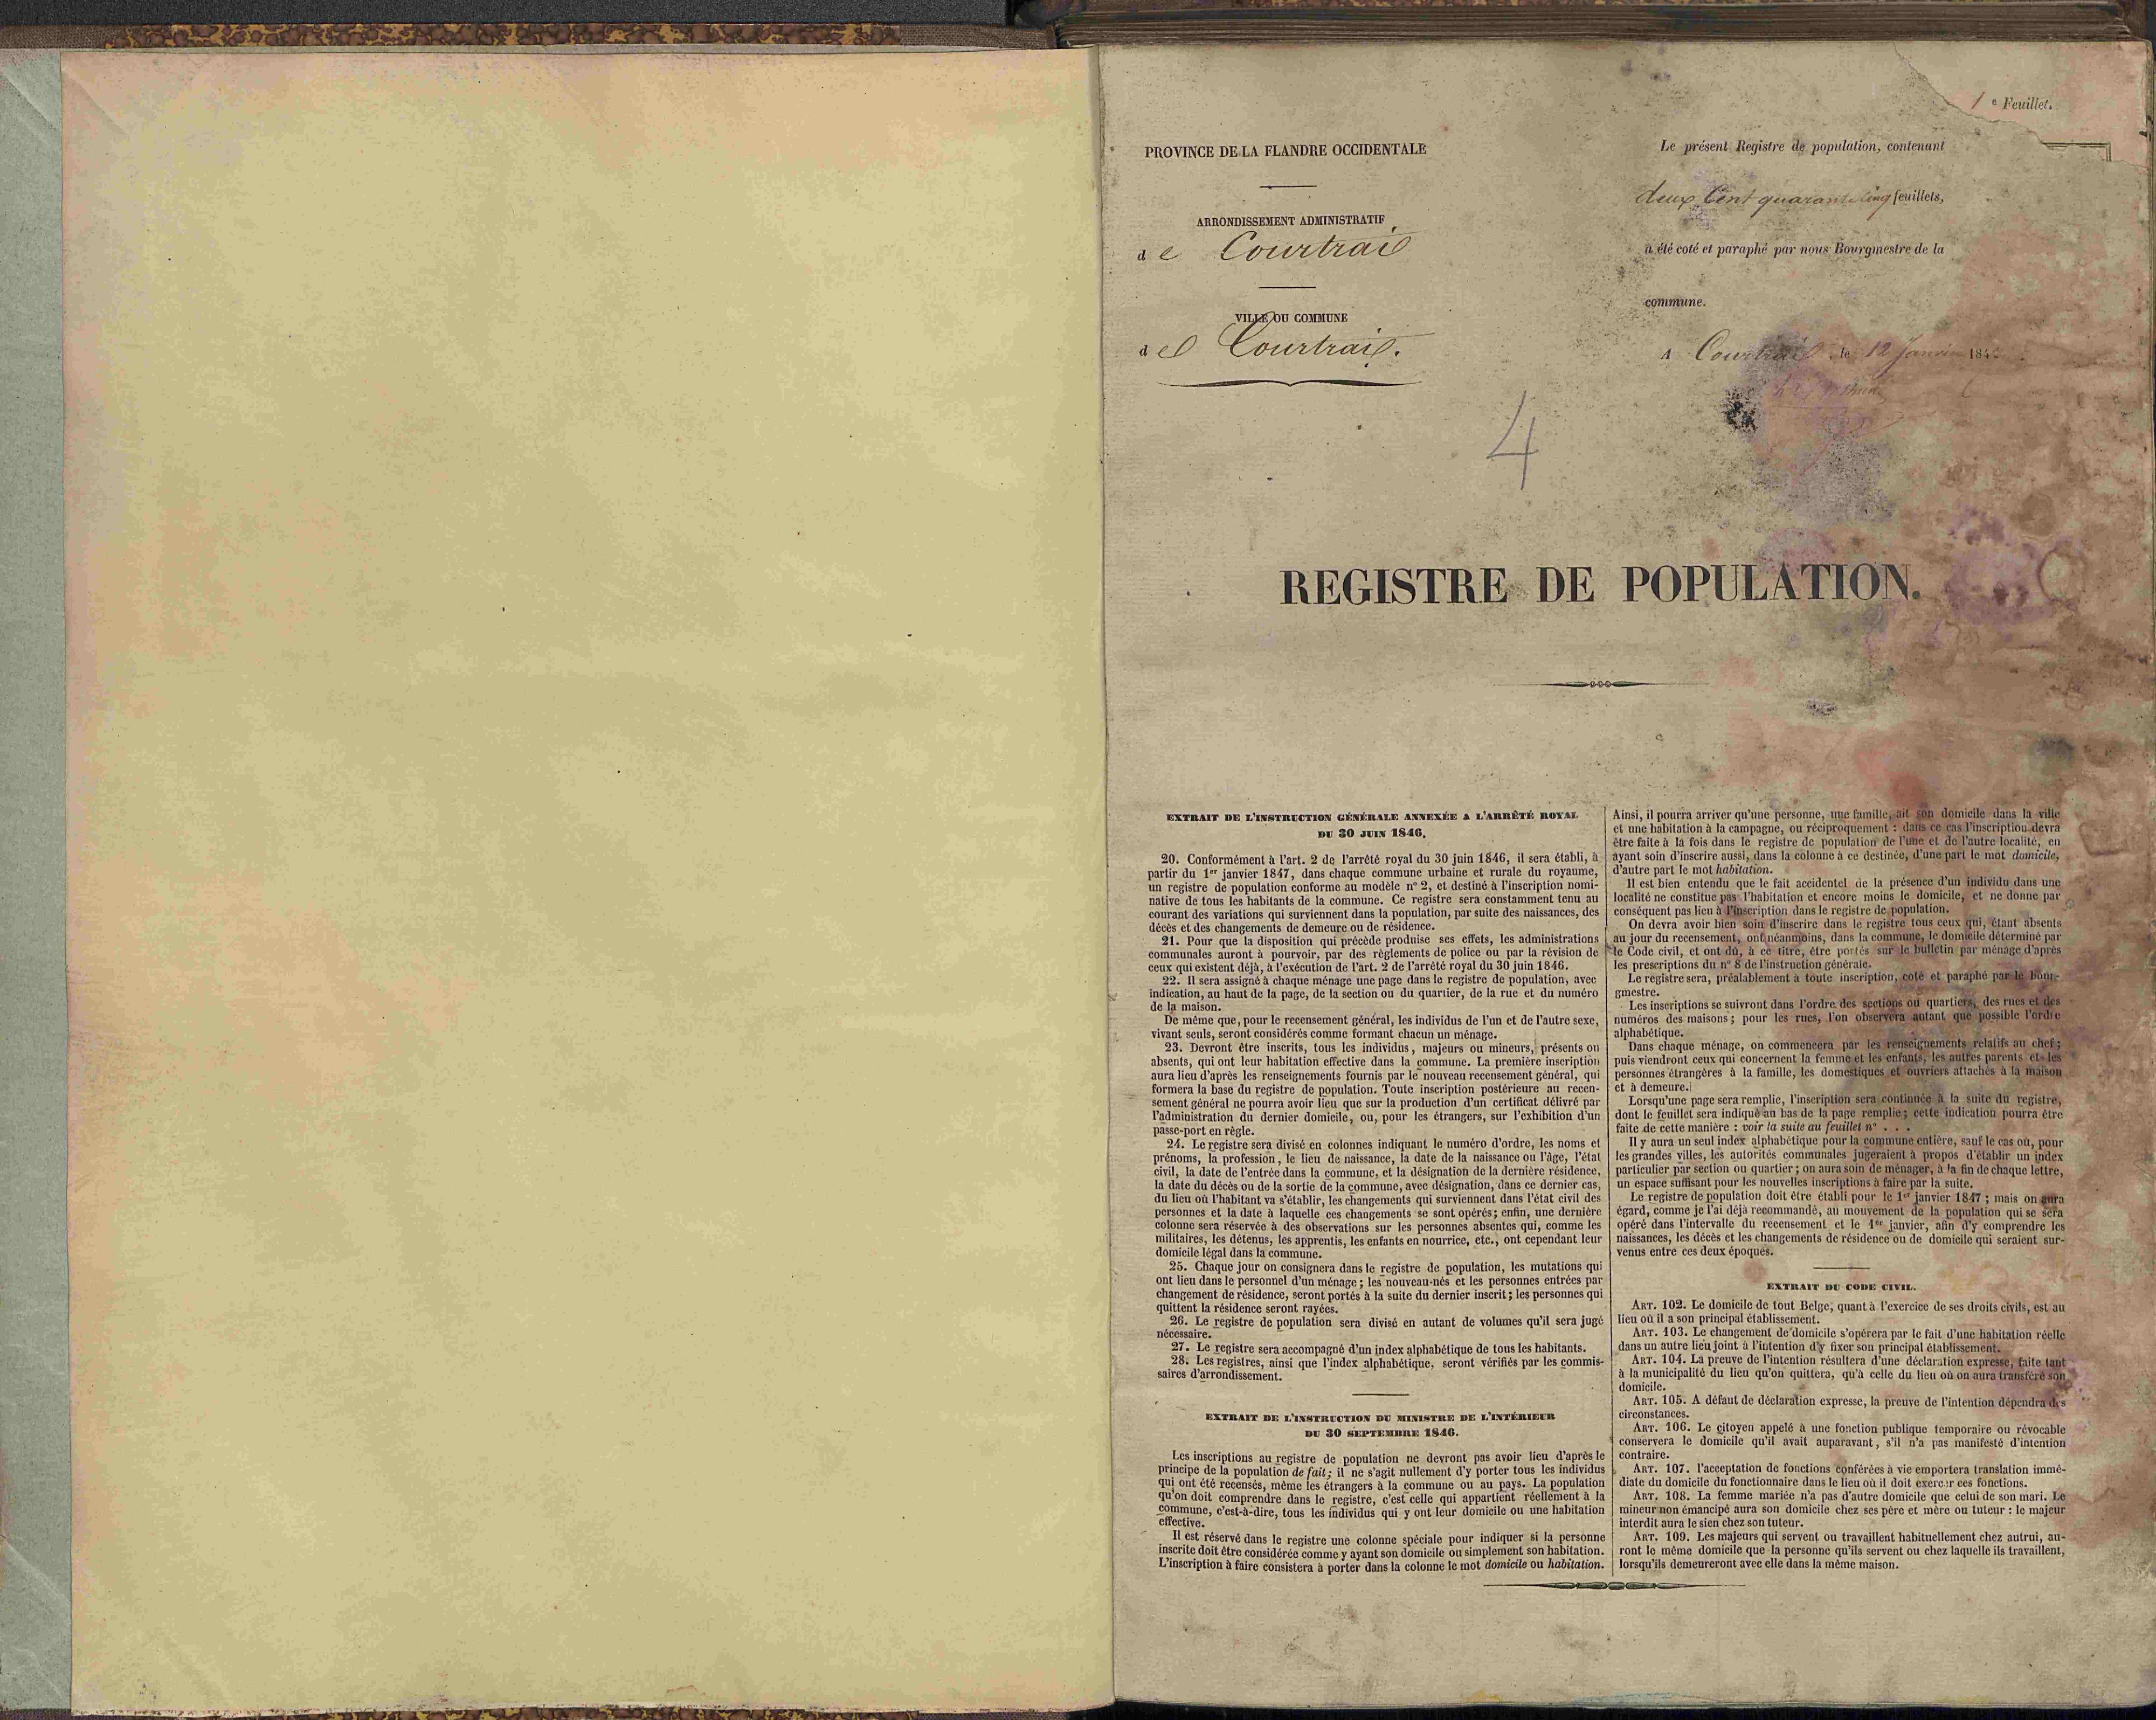 Bevolkingsregister Kortrijk 1846 boek 4